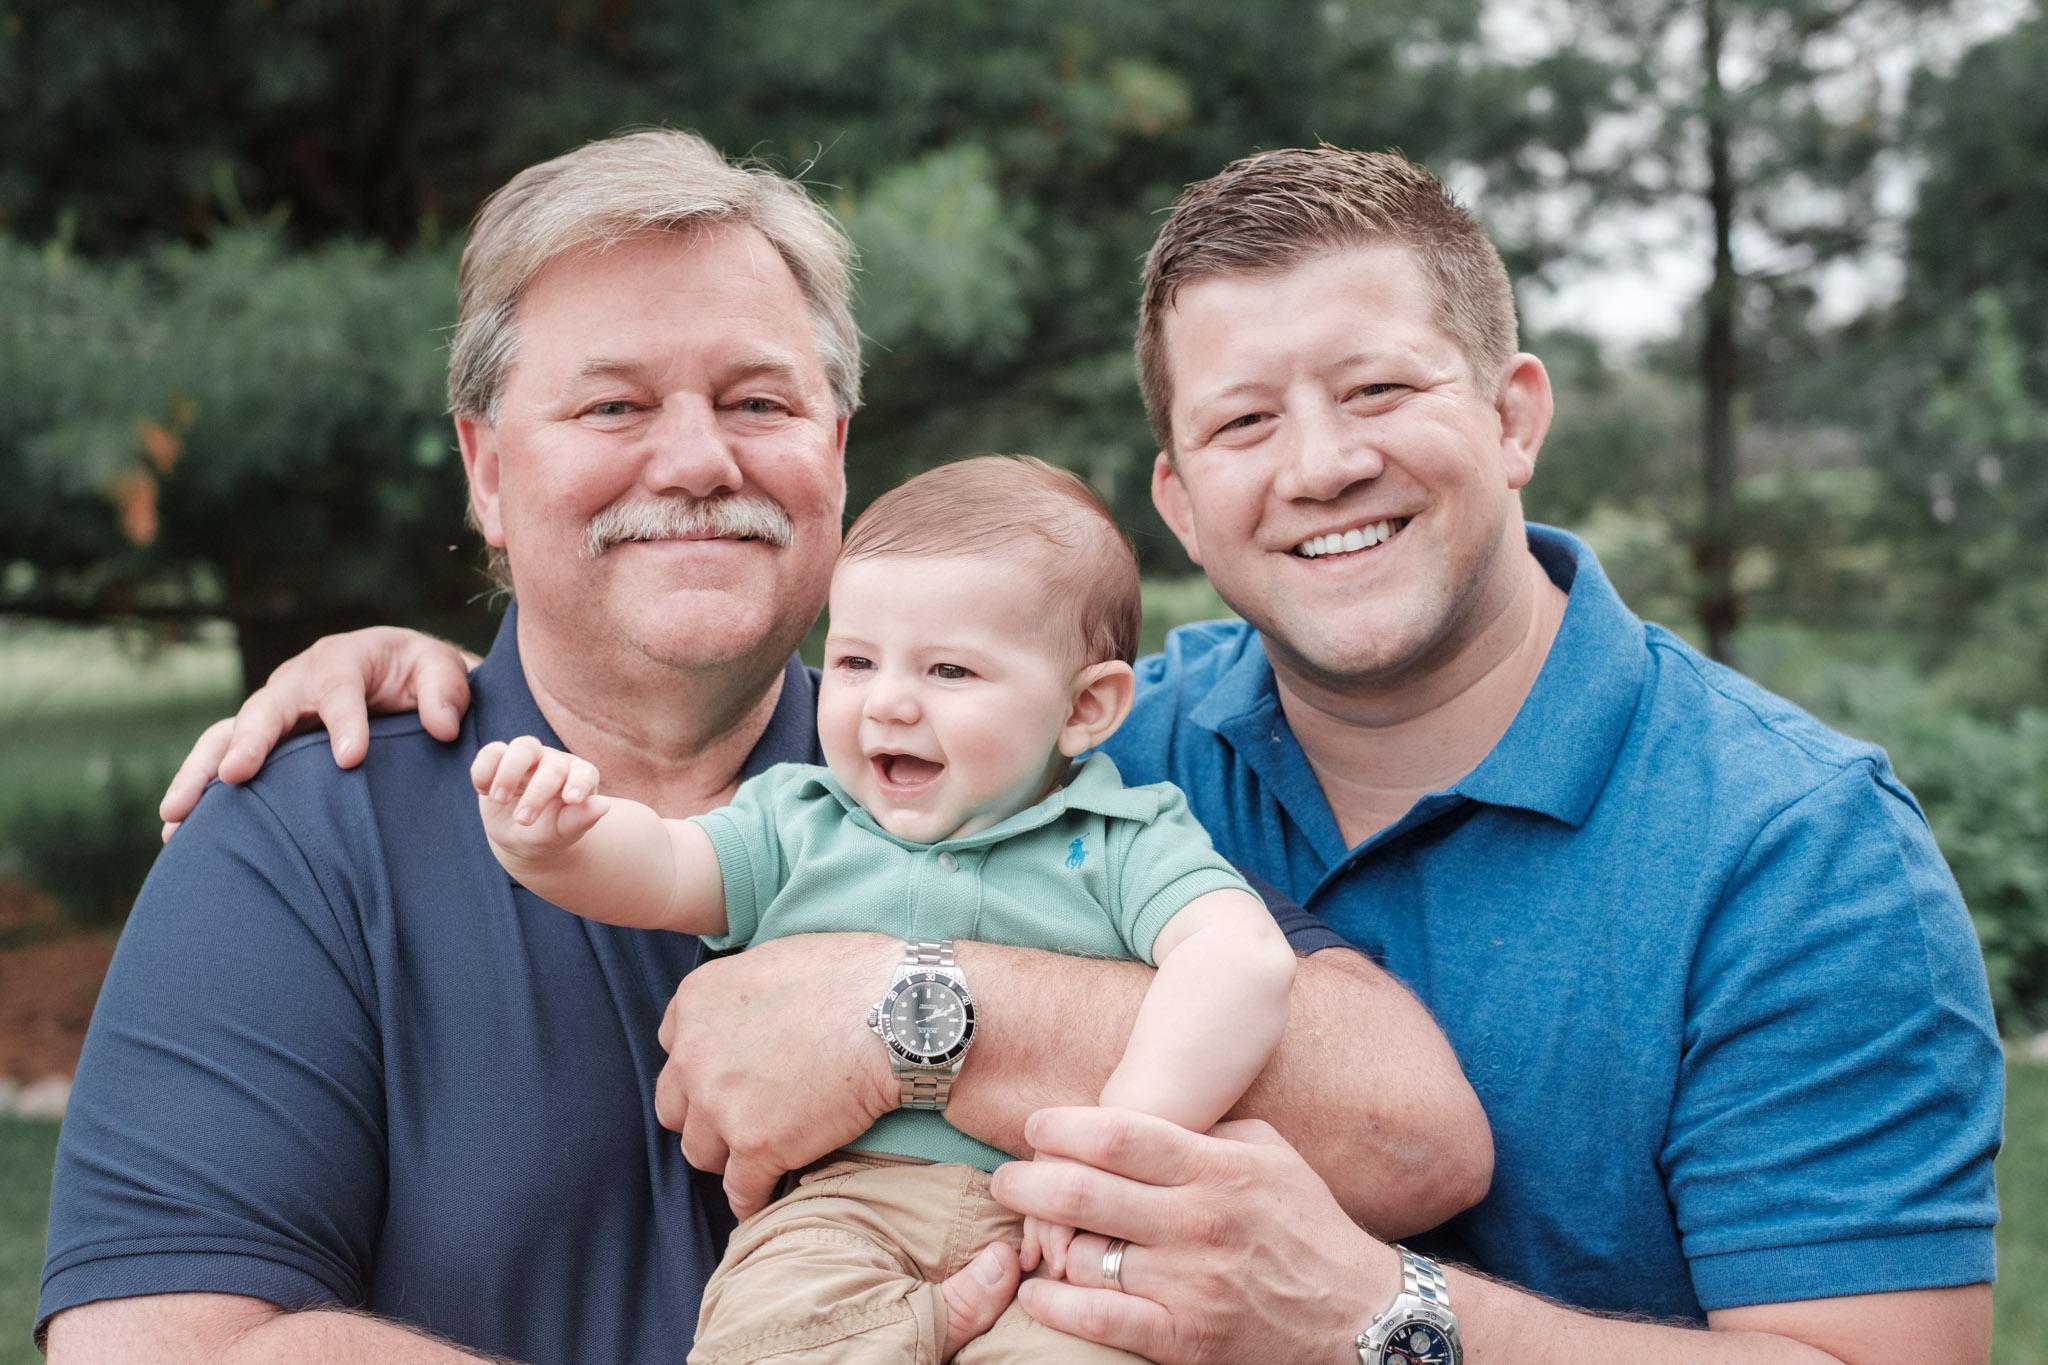 2018 BAP Vandiver Family Photos Roscoe-22.jpg